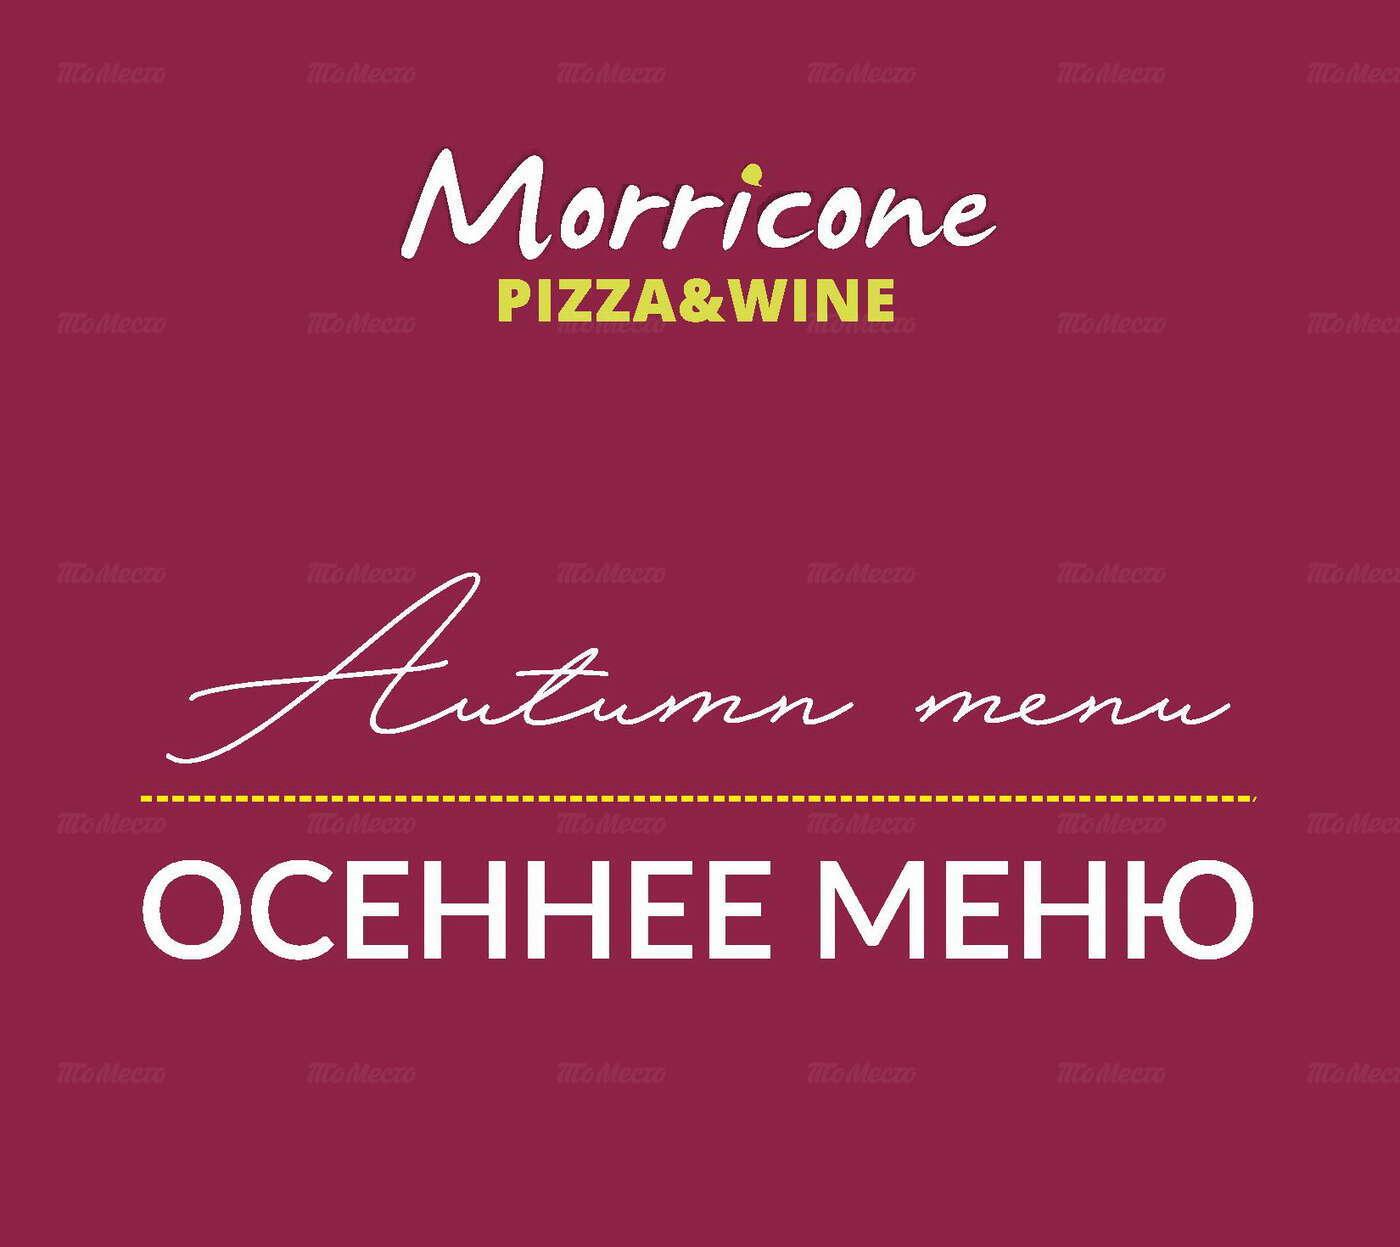 Осеннее меню в Morricone pizza & wine